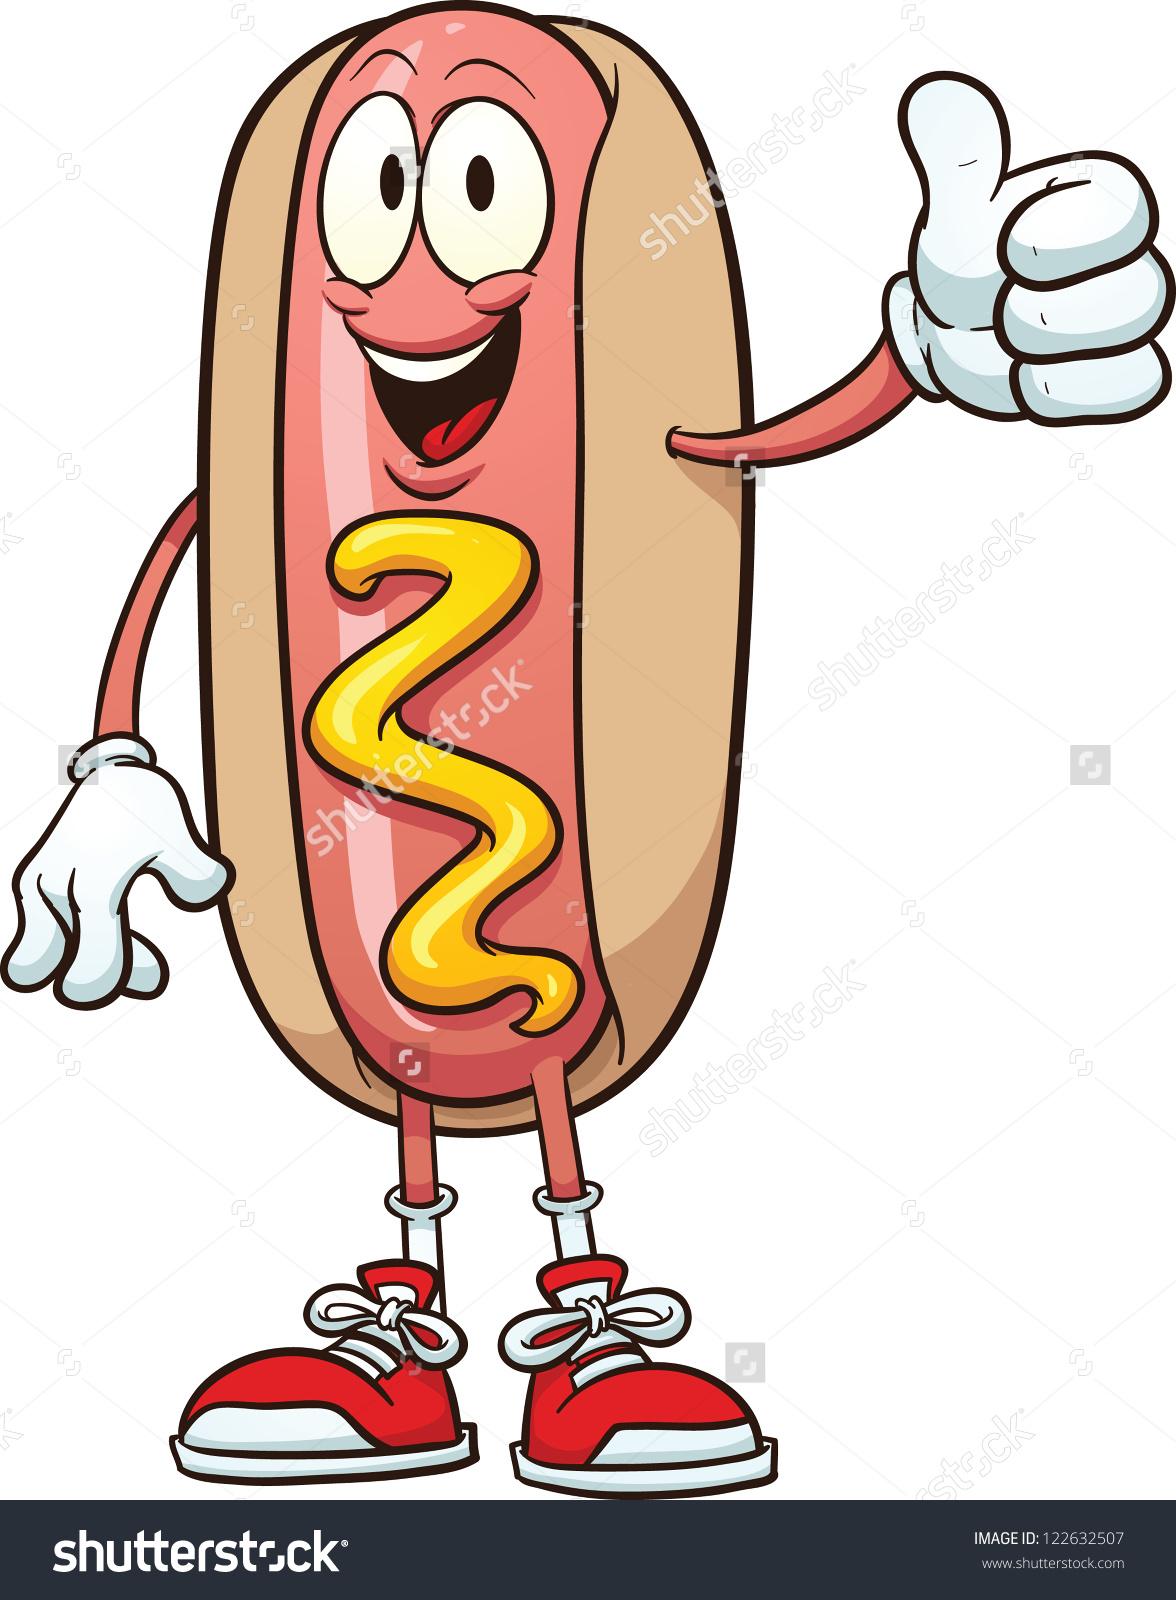 Bacon hot dog clipart.